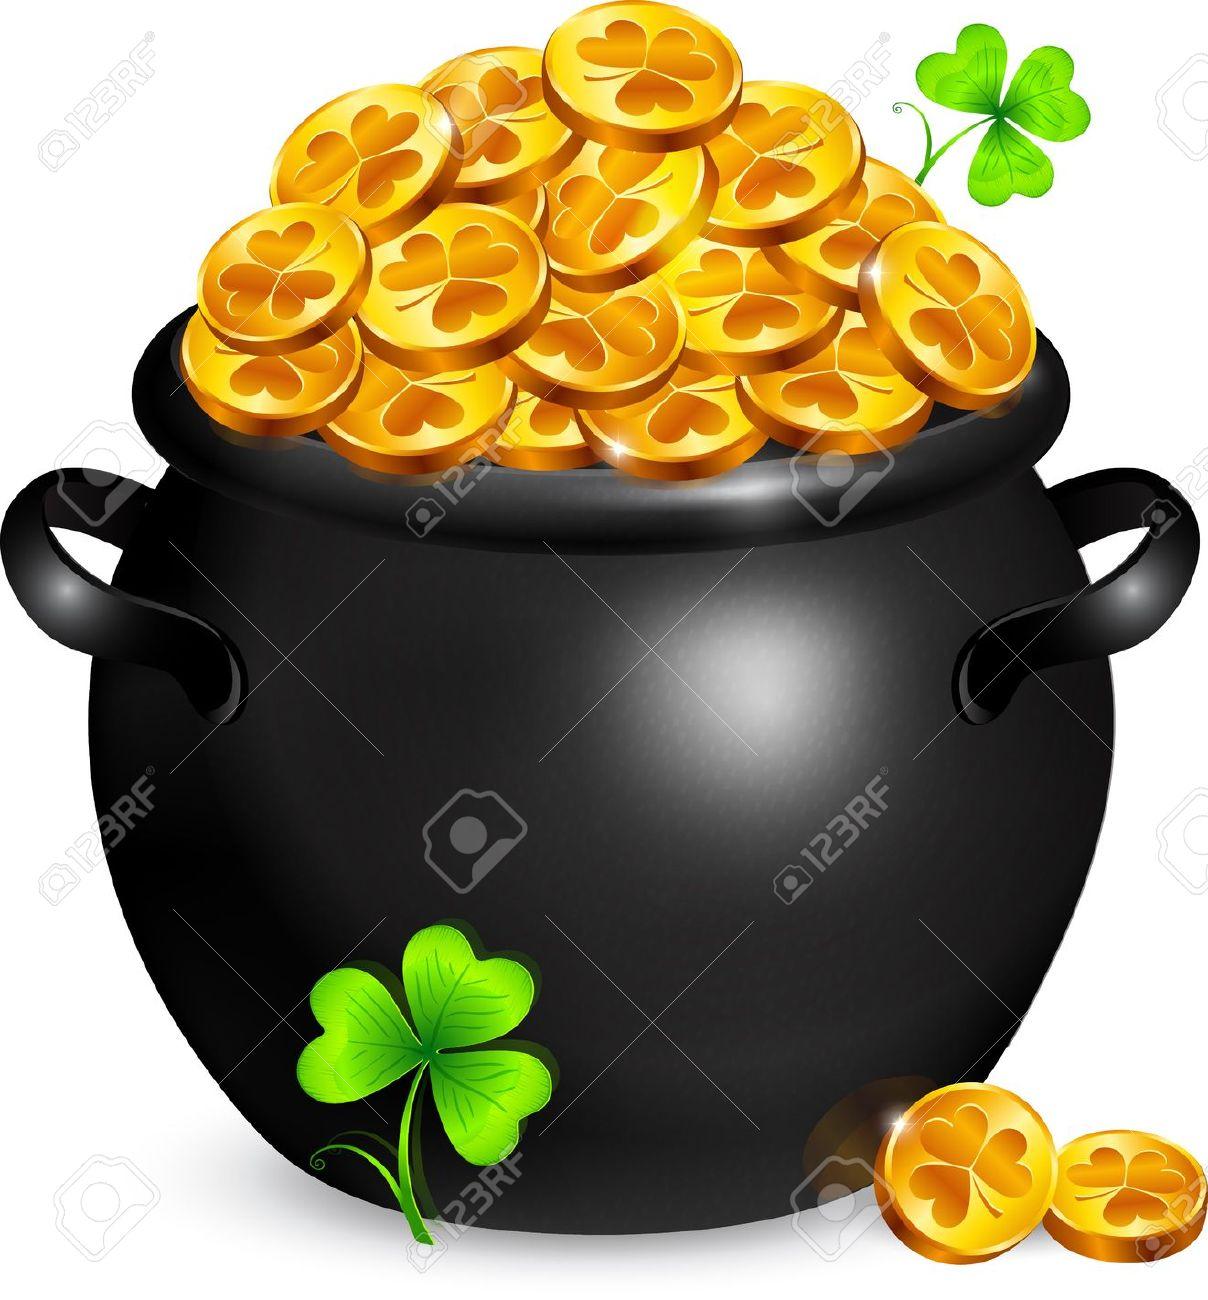 1208x1300 Emojis For Gold Coins Pot Emoji Www.emojilove.us